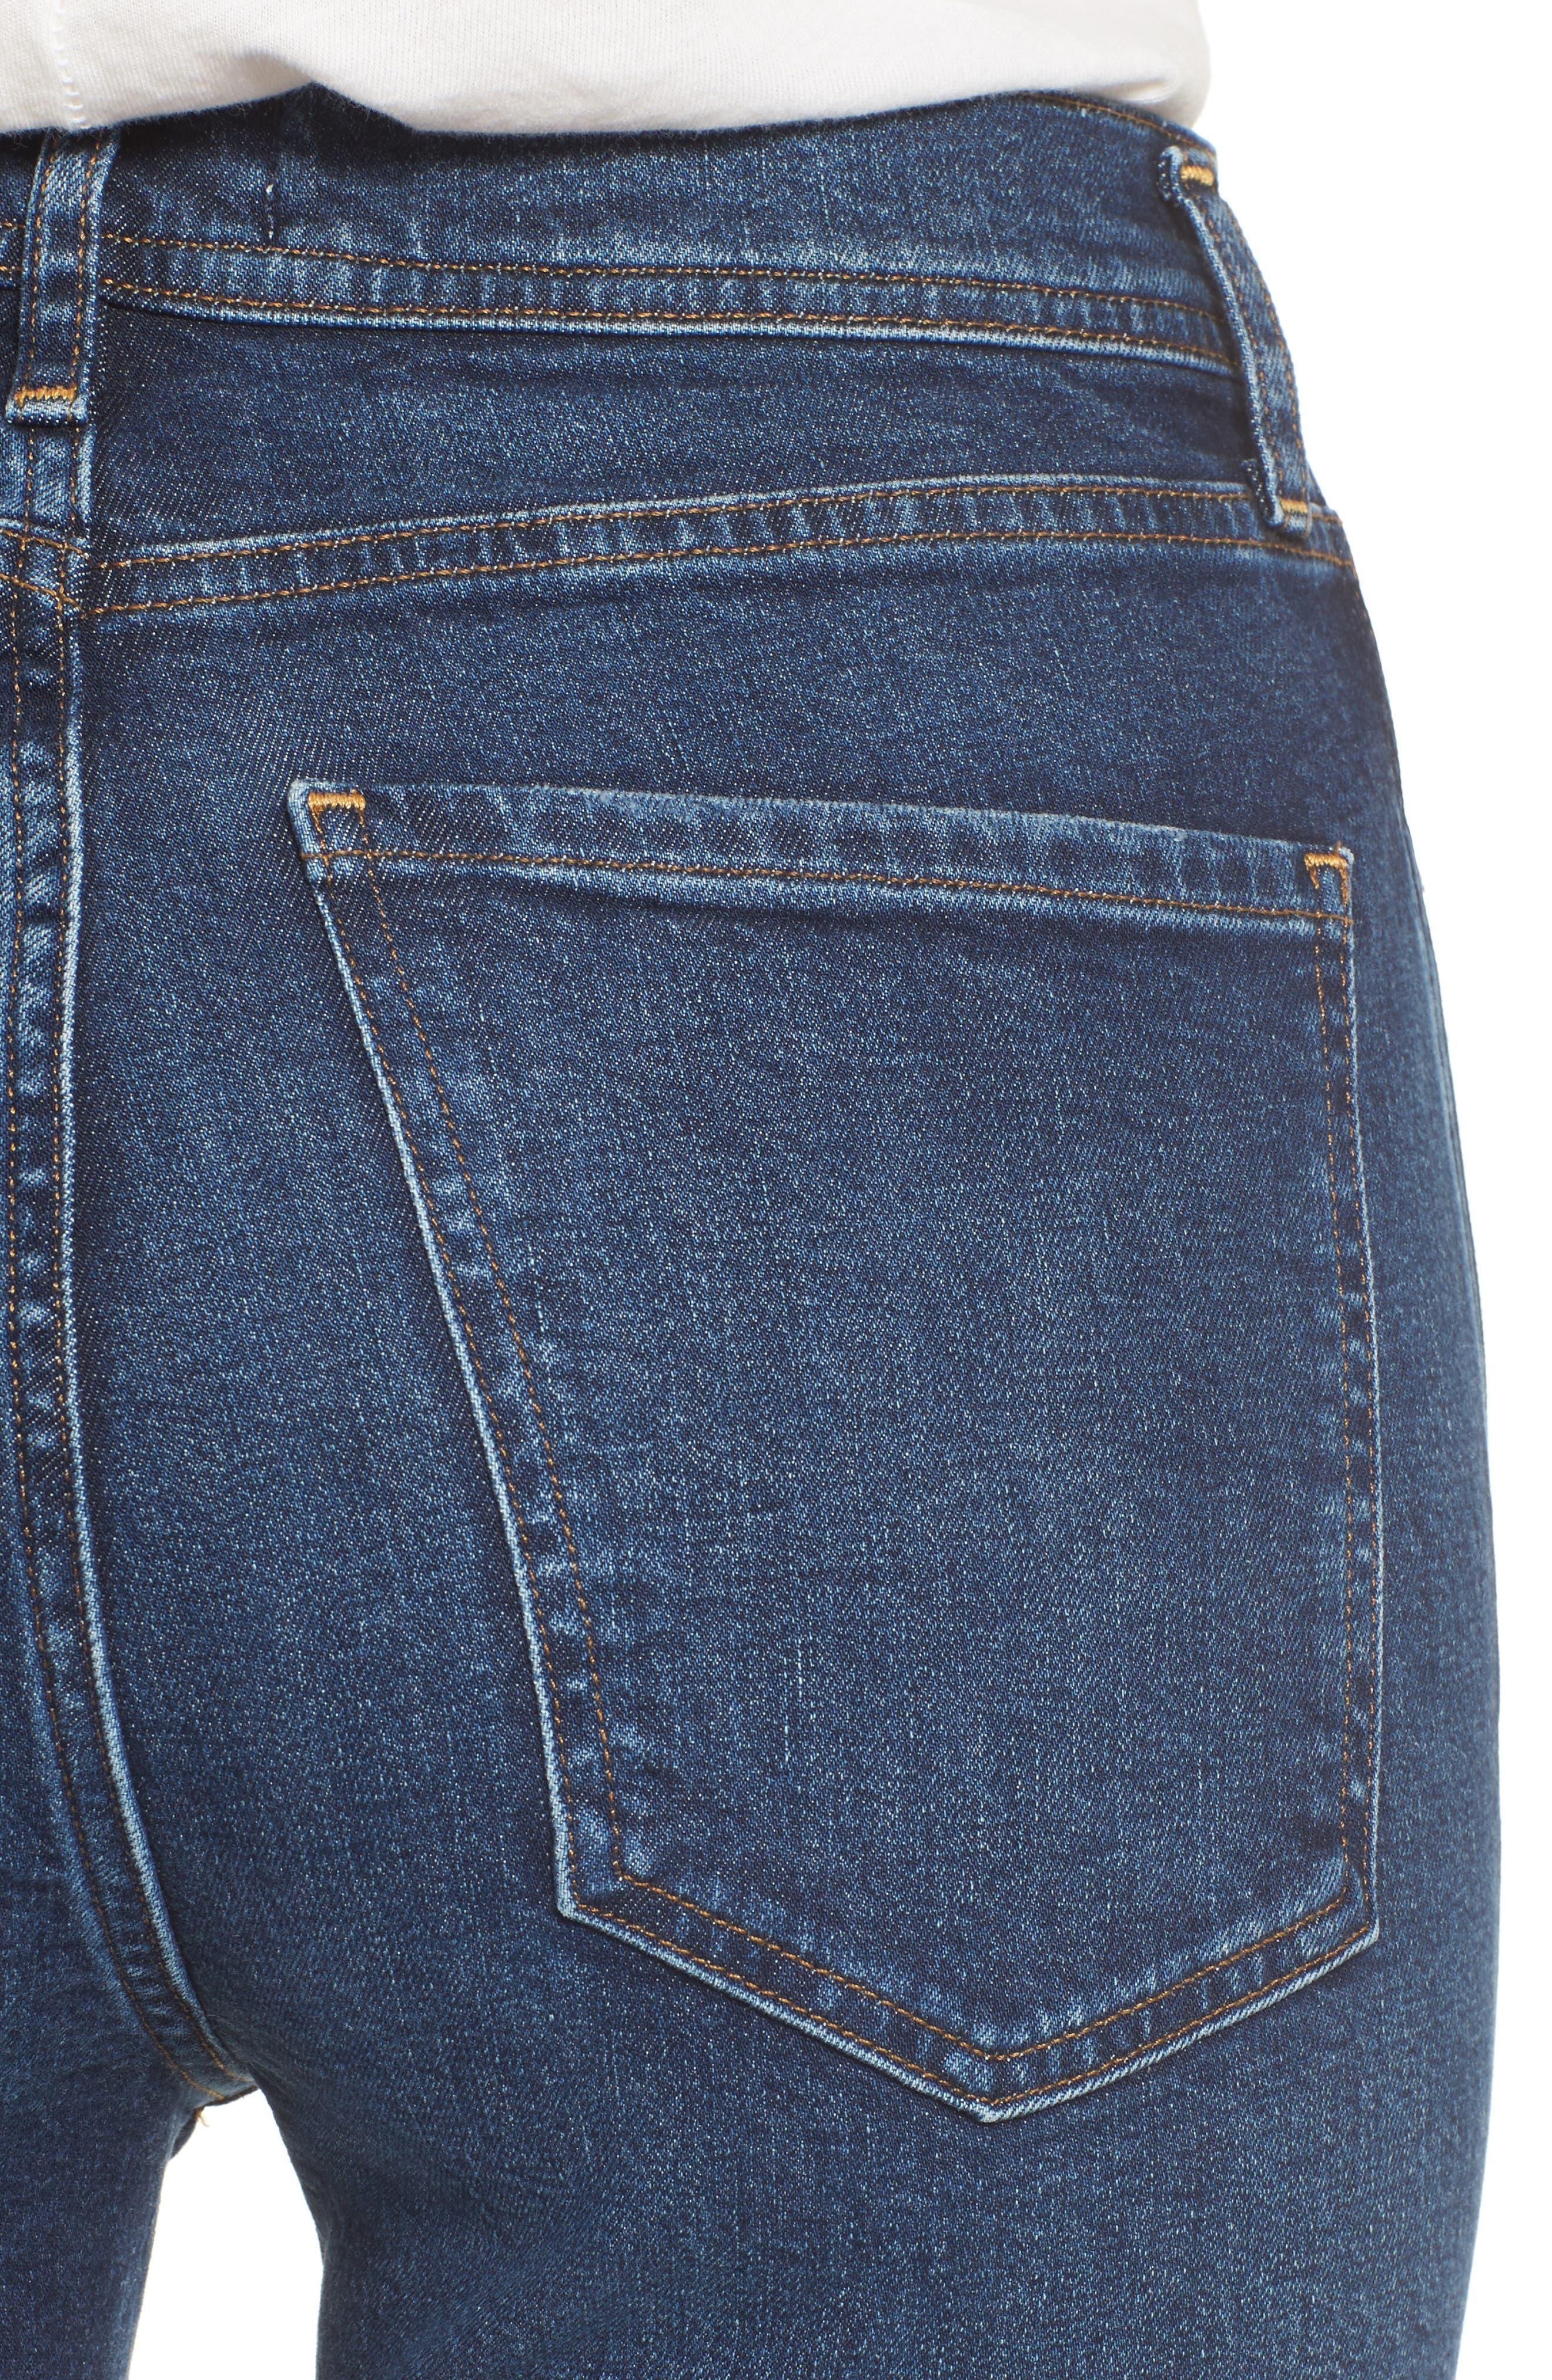 Roxanne Super High Rise Skinny Jeans,                             Alternate thumbnail 4, color,